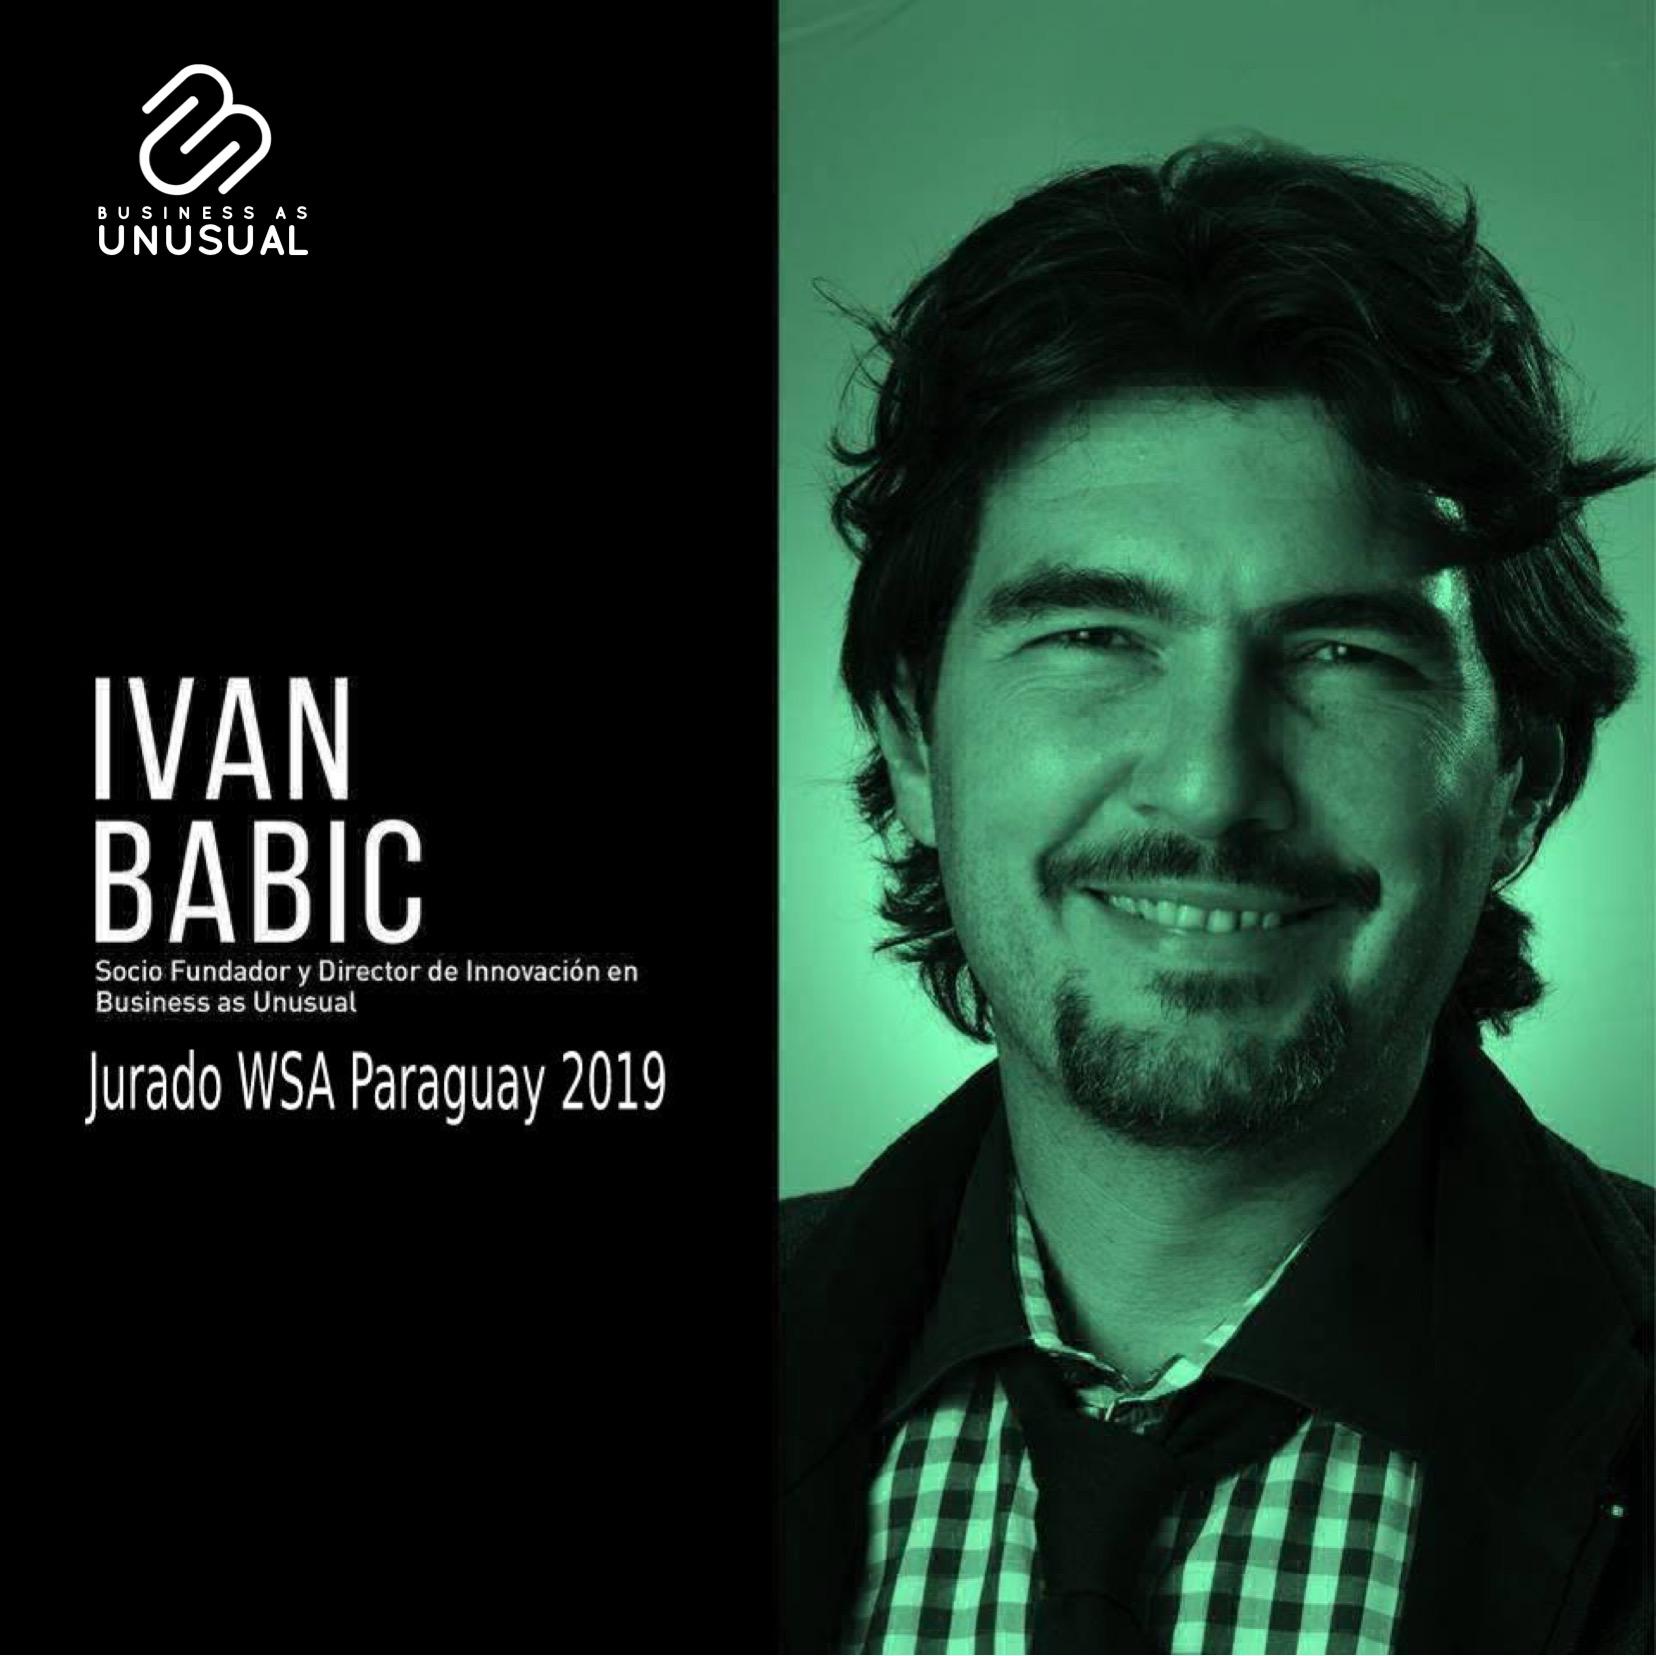 World Summit Awards - Ivan Babic - Paraguay 2019